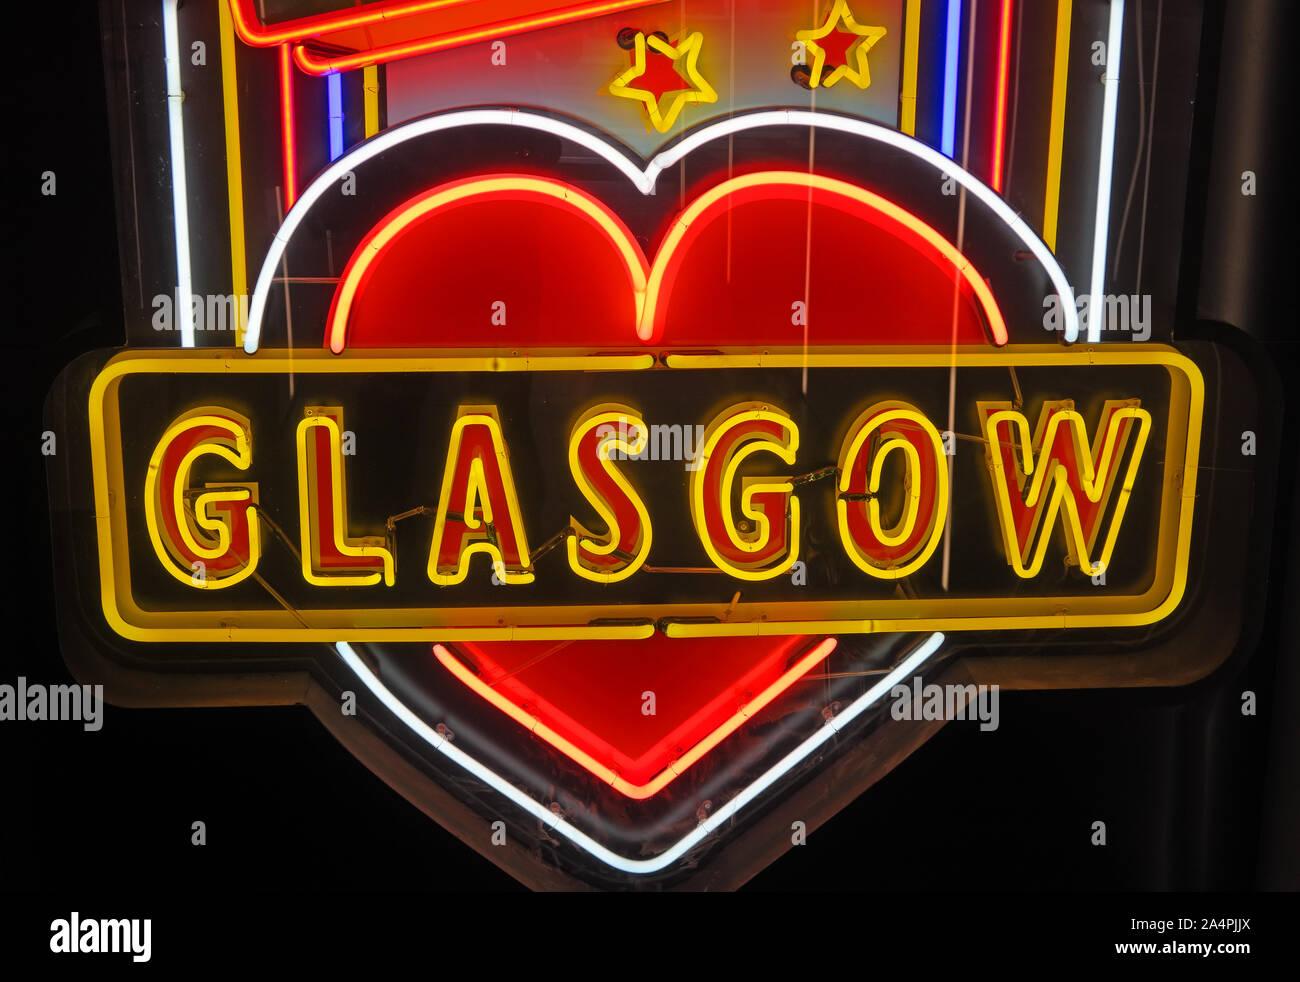 Dieses Stockfoto: Glasgow School of Art, Neon plastische Kunstwerke, Künstler Sinclair Ross, - 2A4PJJ